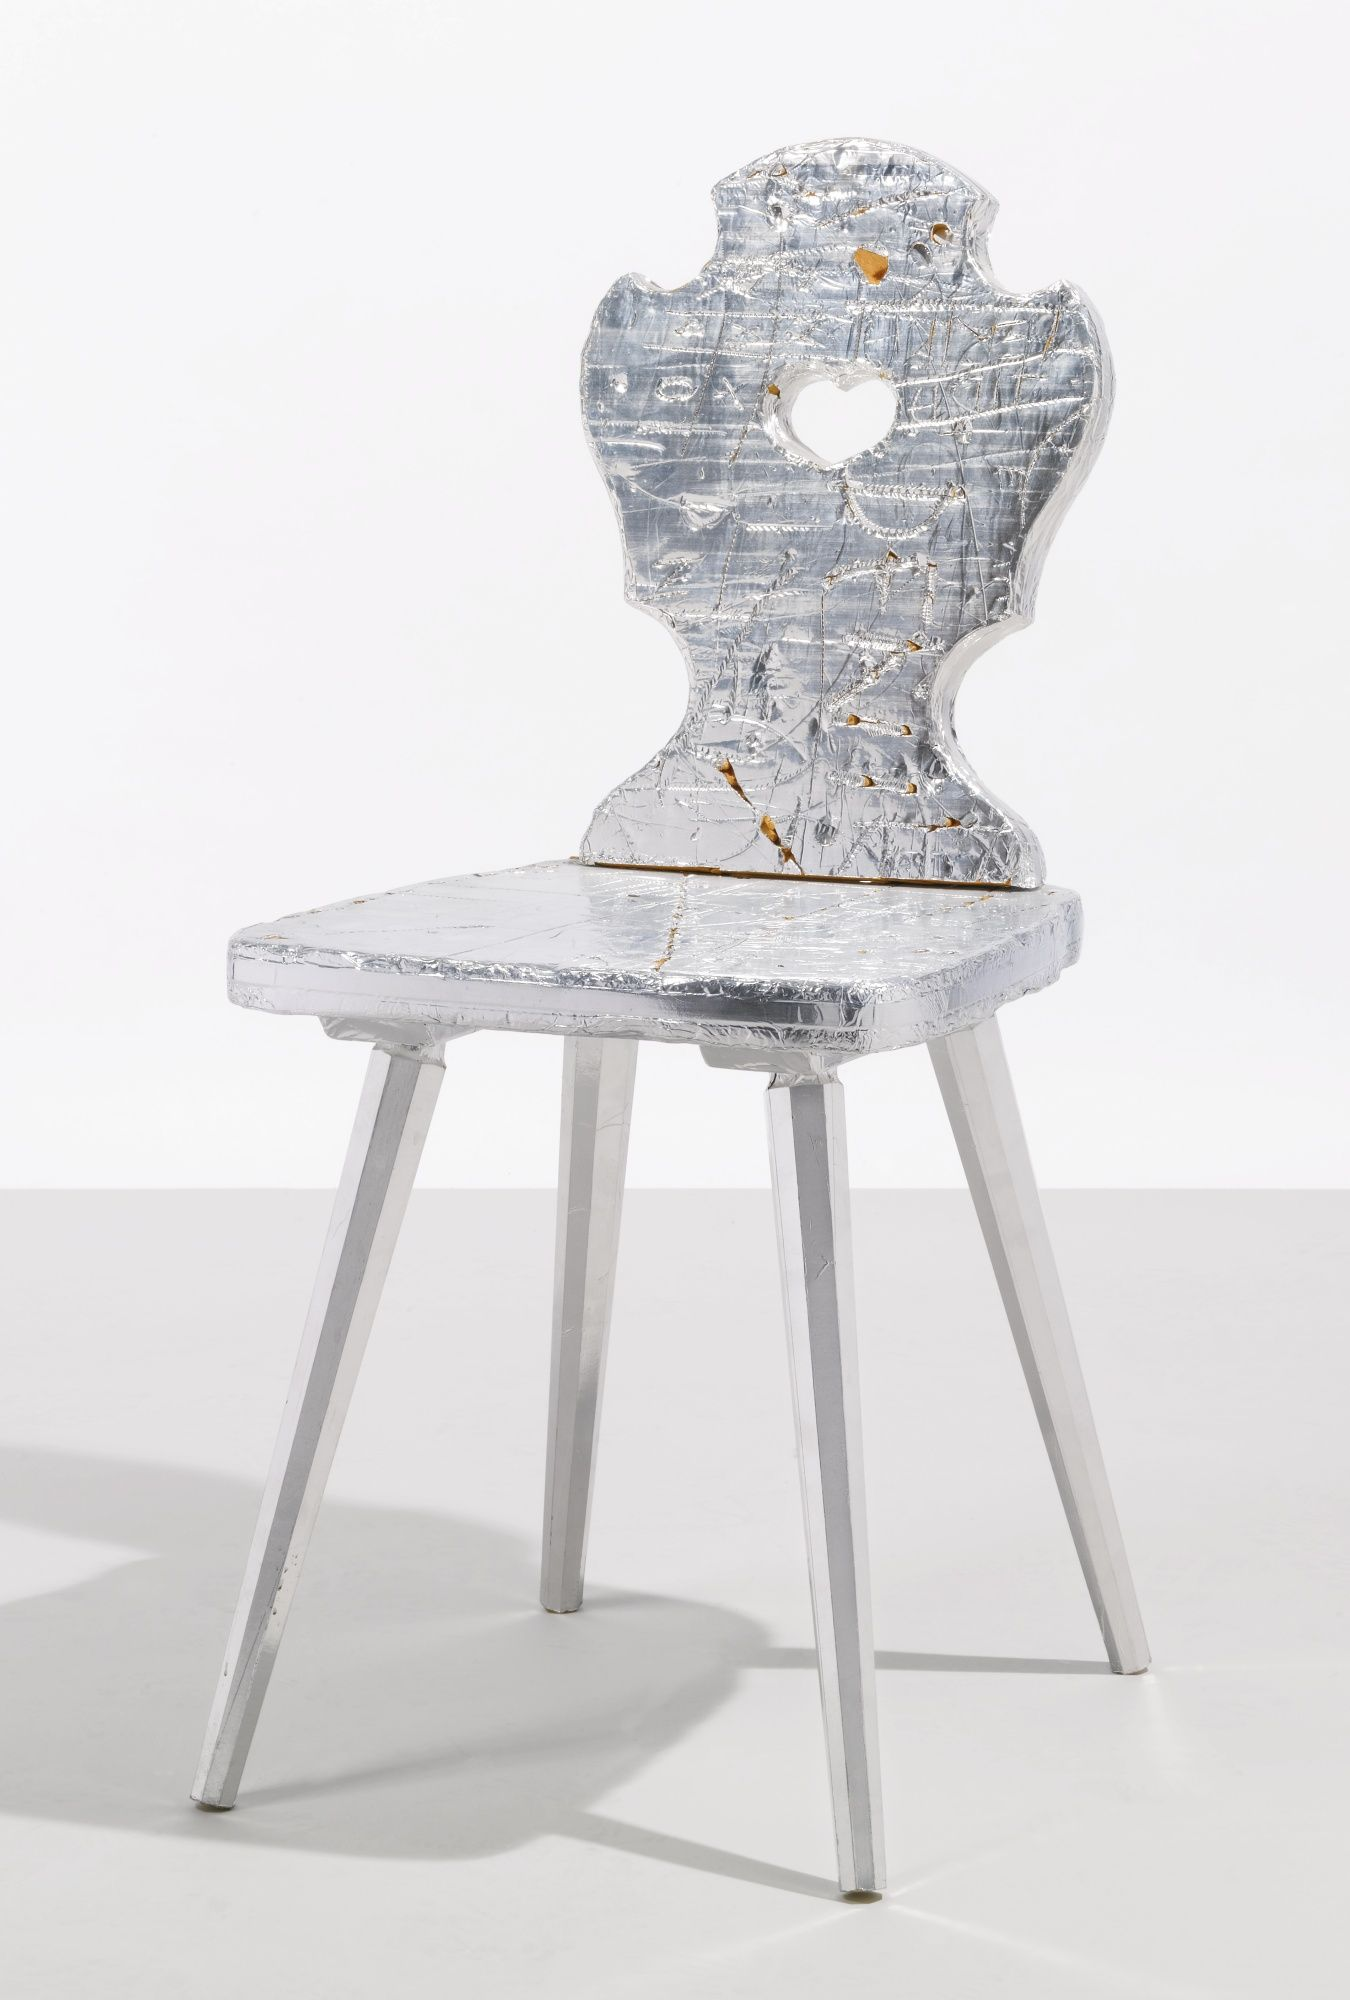 RUDOLF STINGEL A RARE CHAIR celotex insulation, aluminium foil and wood 36 1/8 x 16 1/8 x 19 1/4 in. (91.8 x 40.9 x 48.9 cm) circa 2006